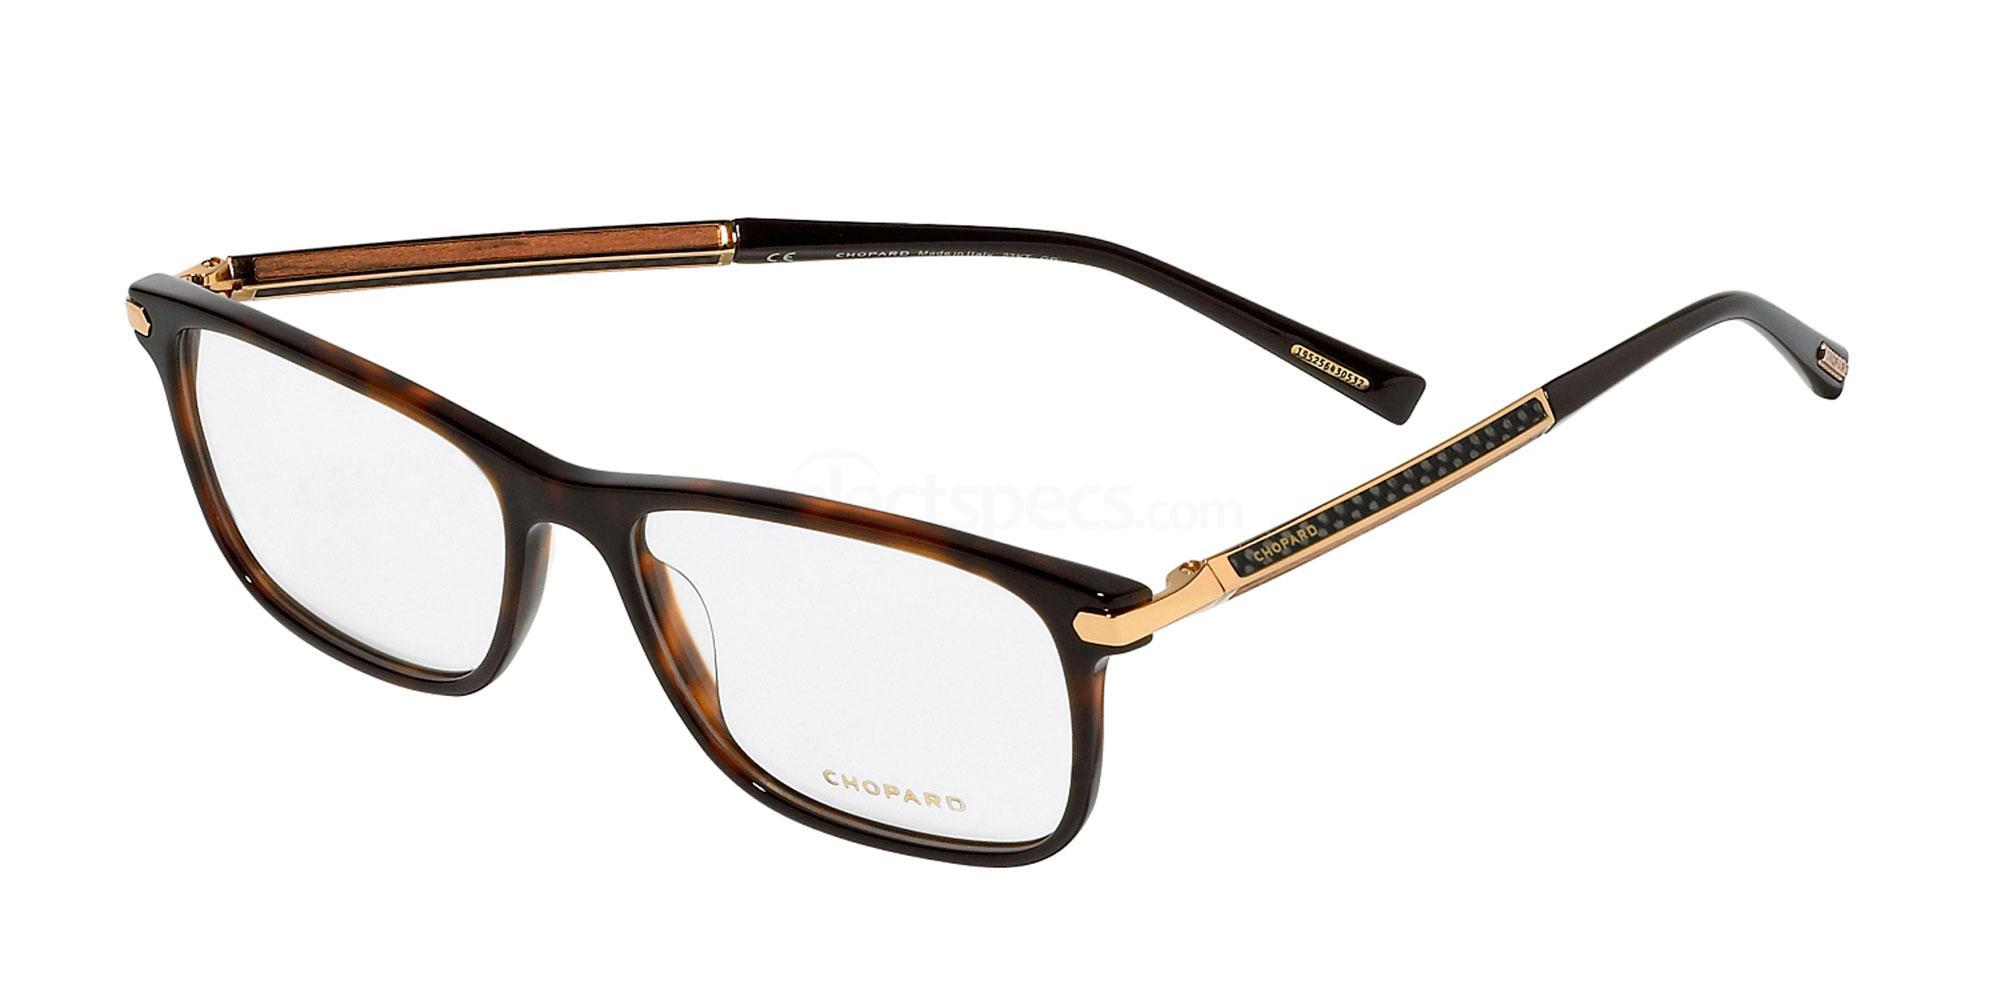 01AY VCH249 Glasses, Chopard